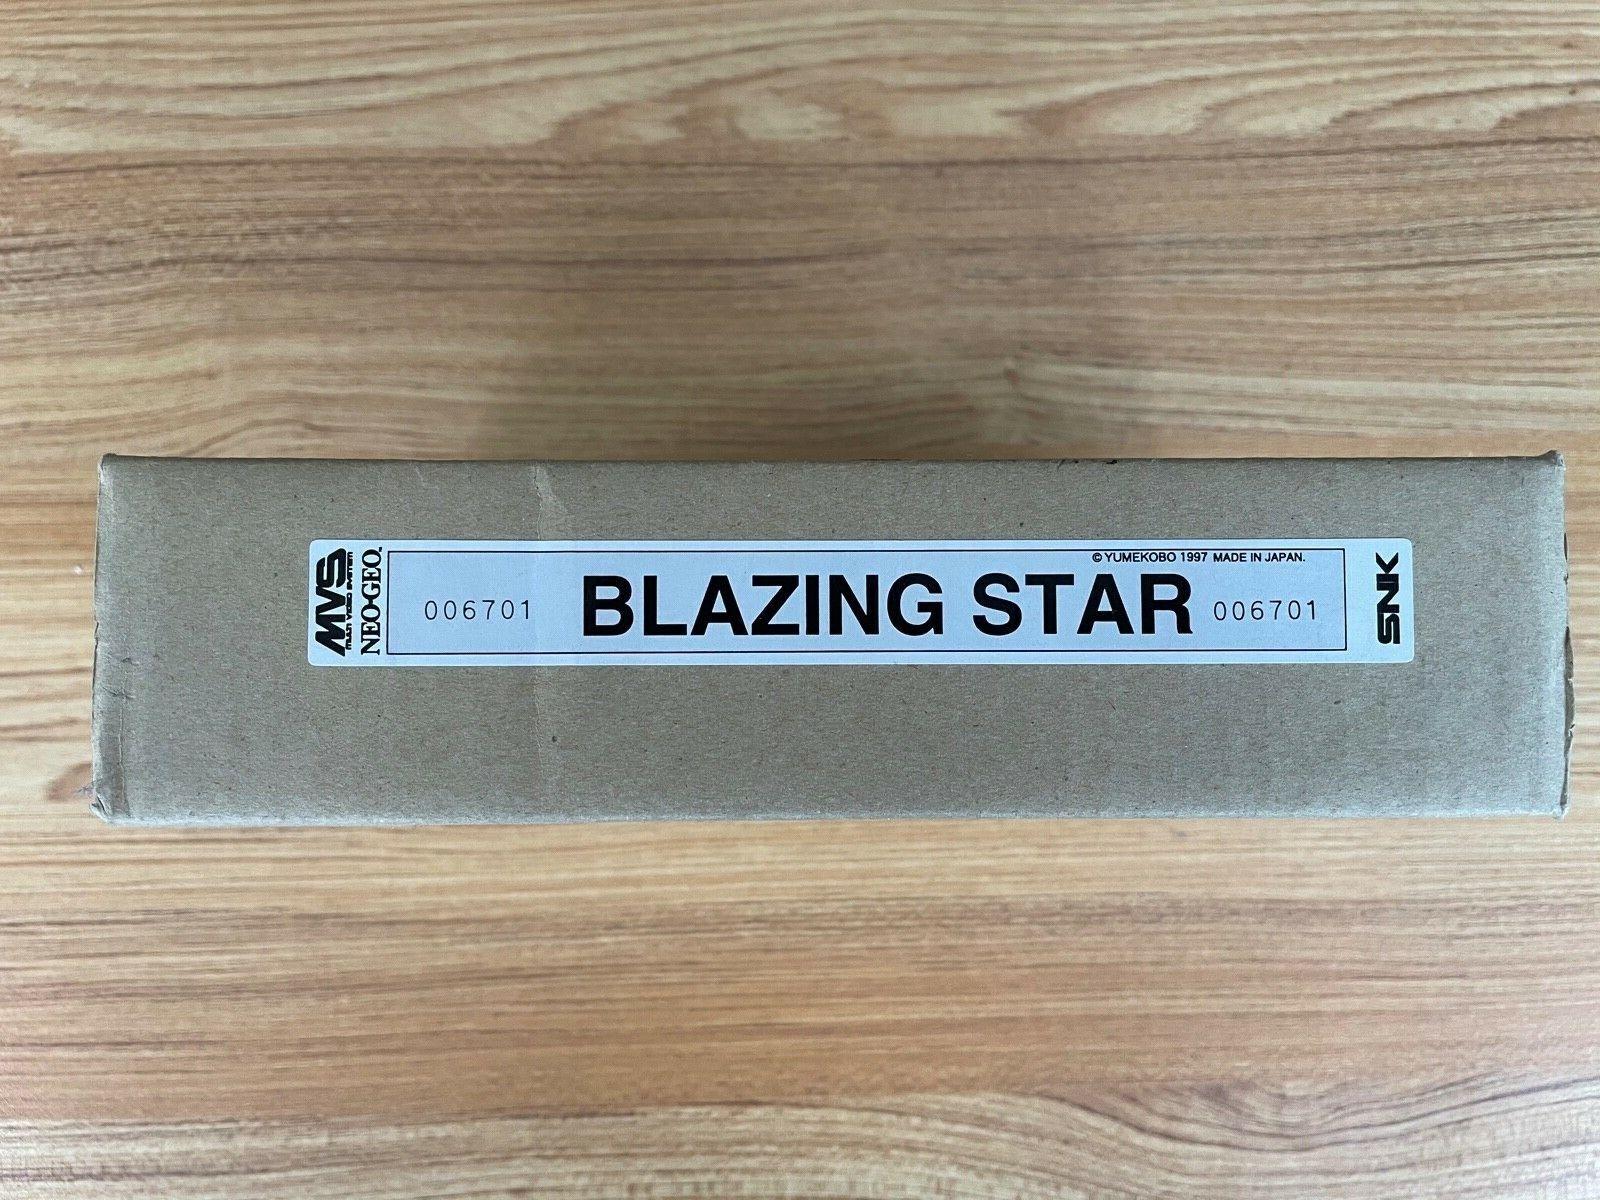 Blazing Star Neo-Geo MVS Full Kit matching serial 006701 WHAT YOU WAITING FOR?!